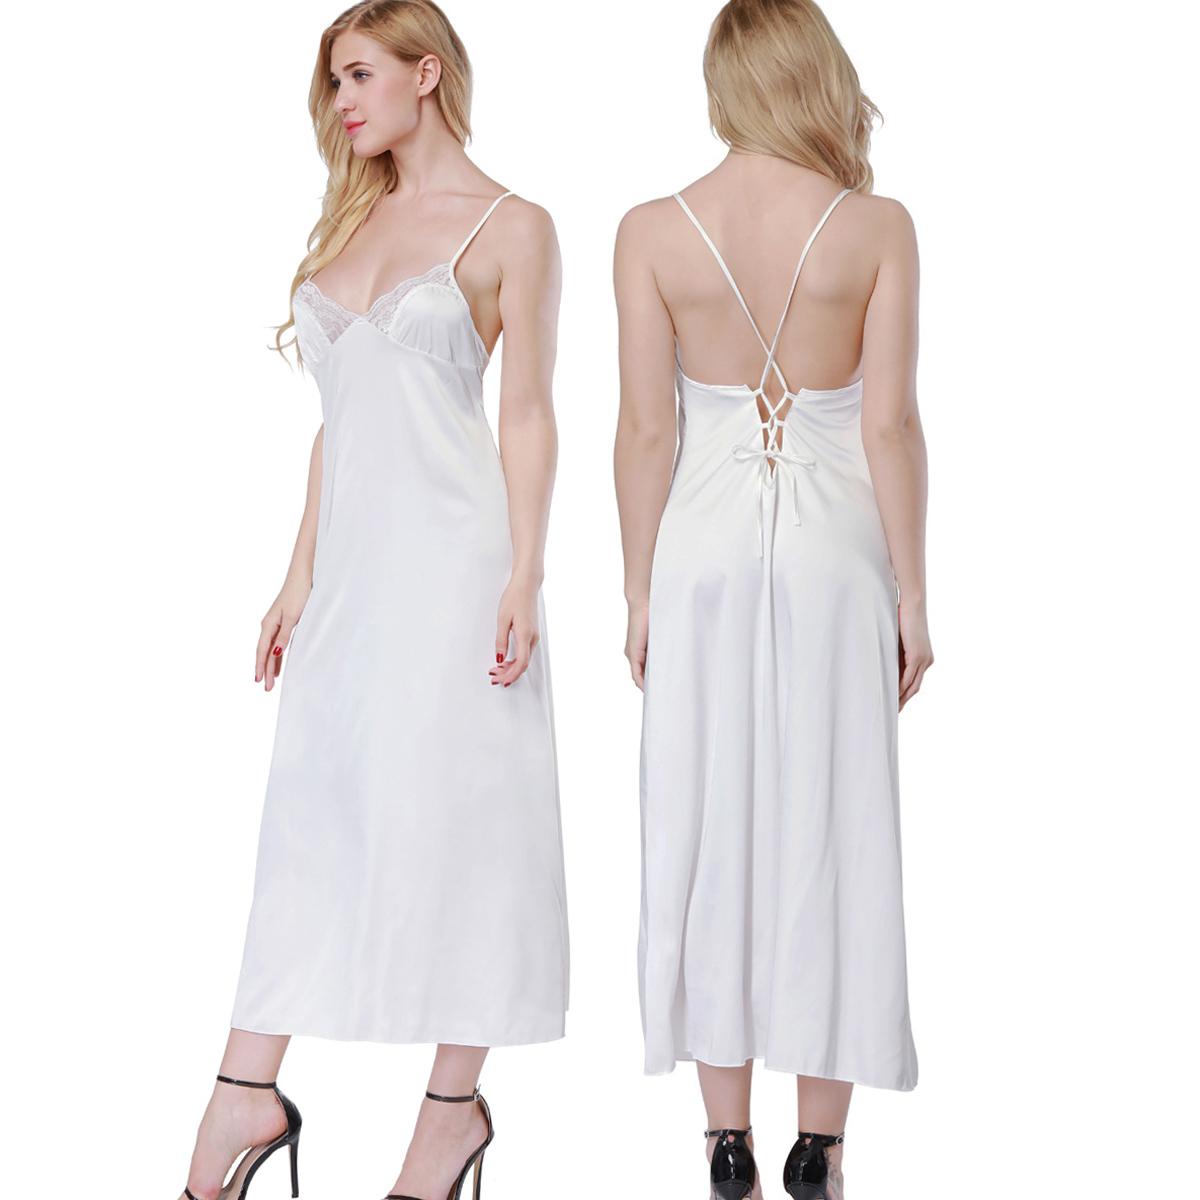 Womens Sleepwear V-neck Satin Nightgown Long Night Dress Full Length ...